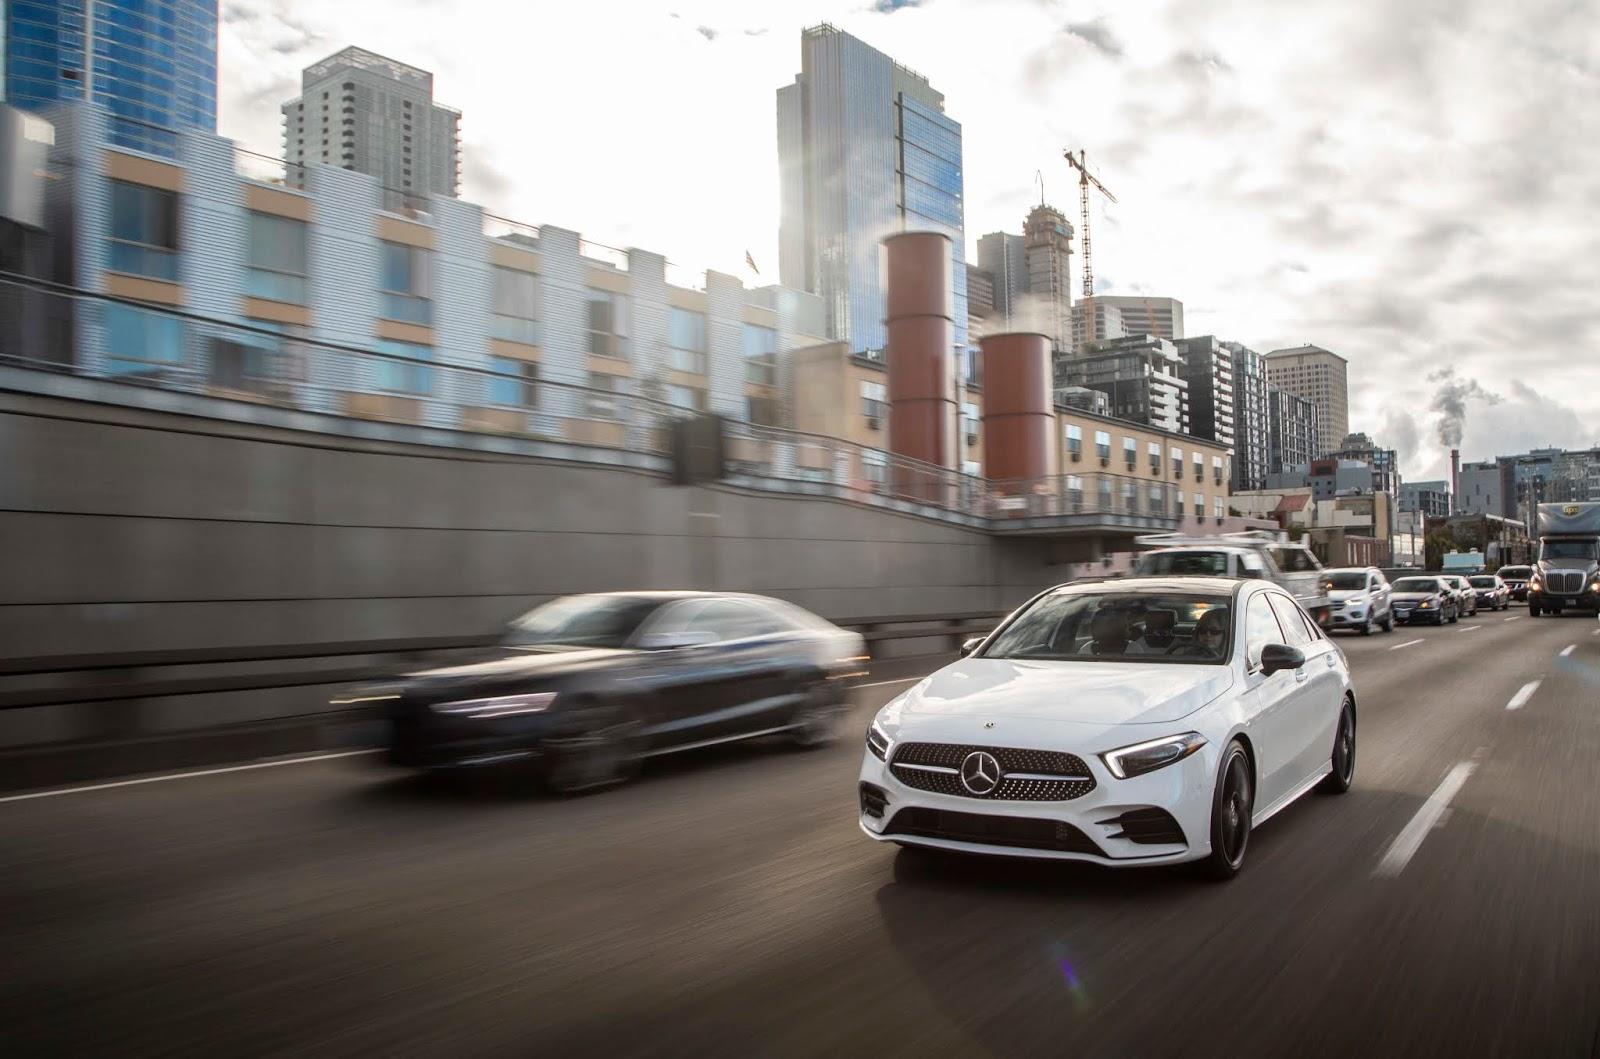 18C0775 004 Από 28.230 ευρώ η τιμή της Mercedes A-Class Sedan Luxury sedan, Mercedes, Mercedes AMG, premium sedan, sedan, zblog, καινούργιο, καινούρια, τιμες